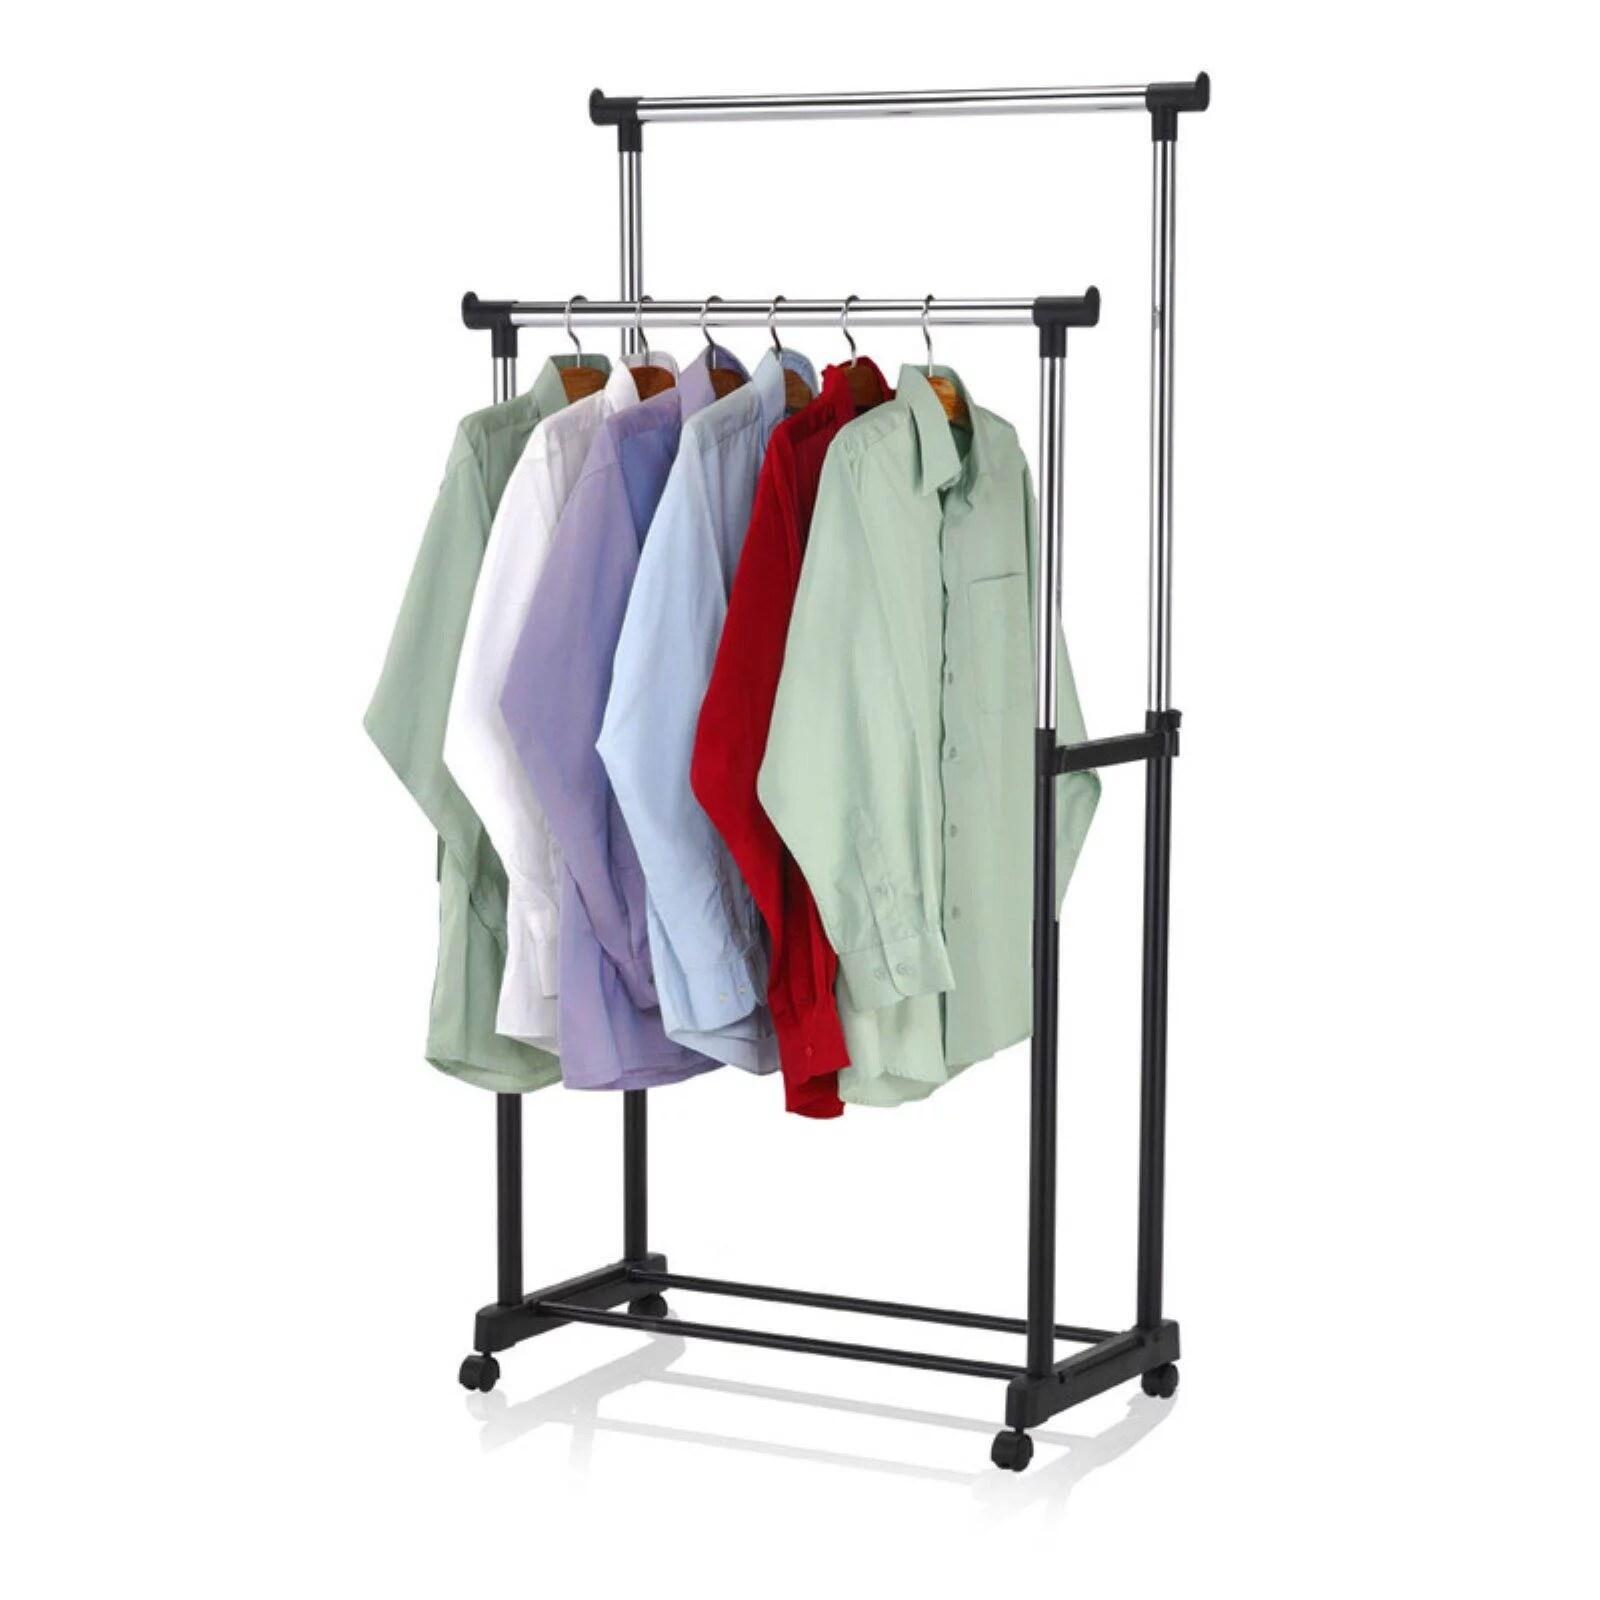 sunbeam double hanging garment rack with wheels